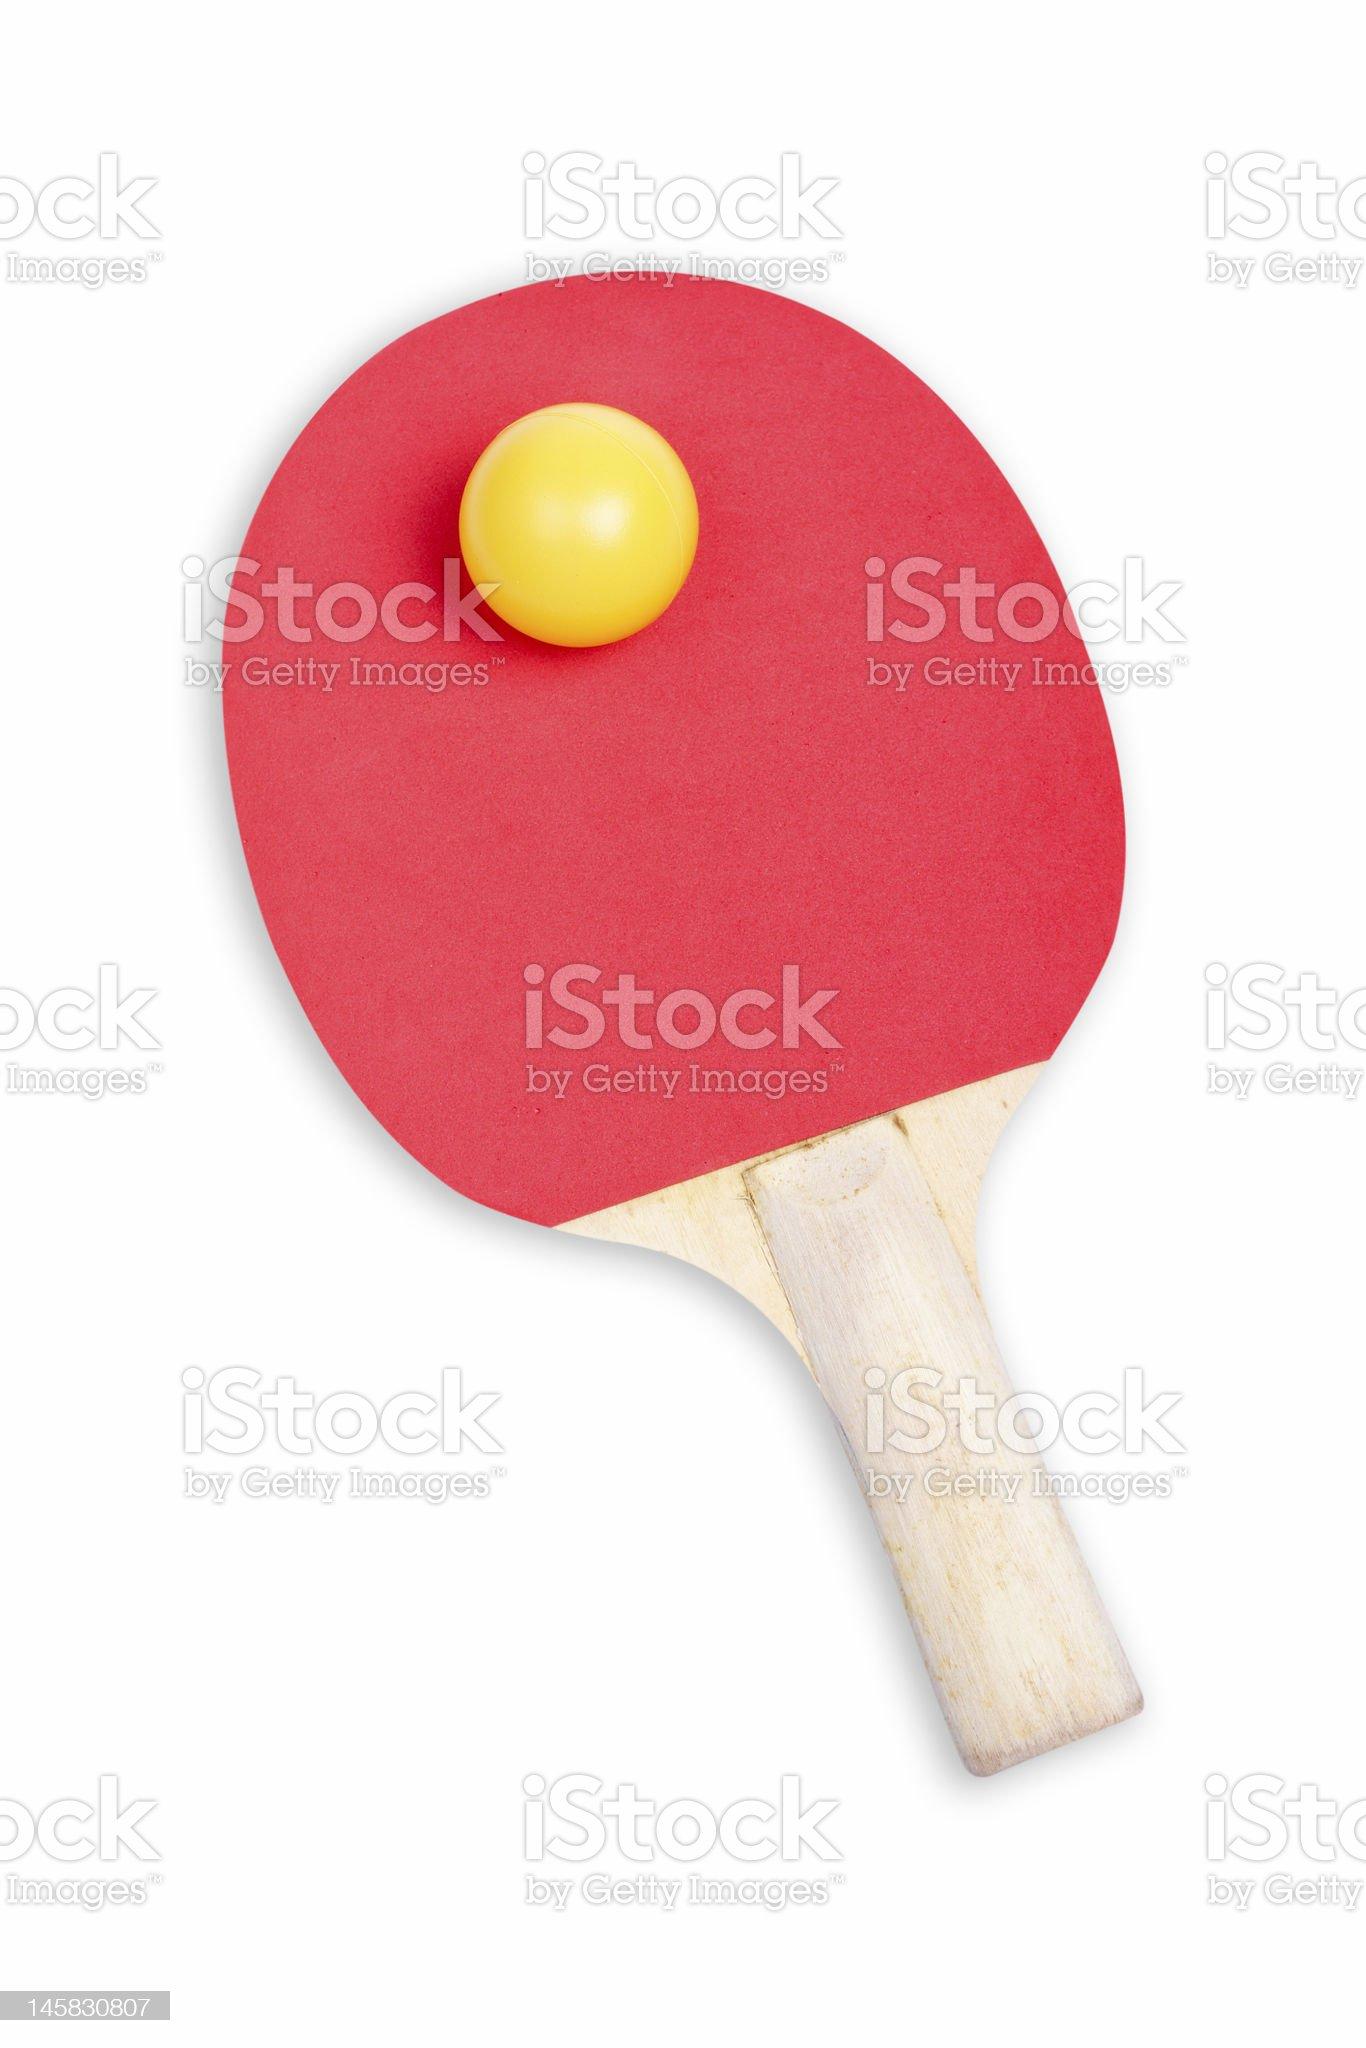 Ping pong paddle and yellow ball royalty-free stock photo